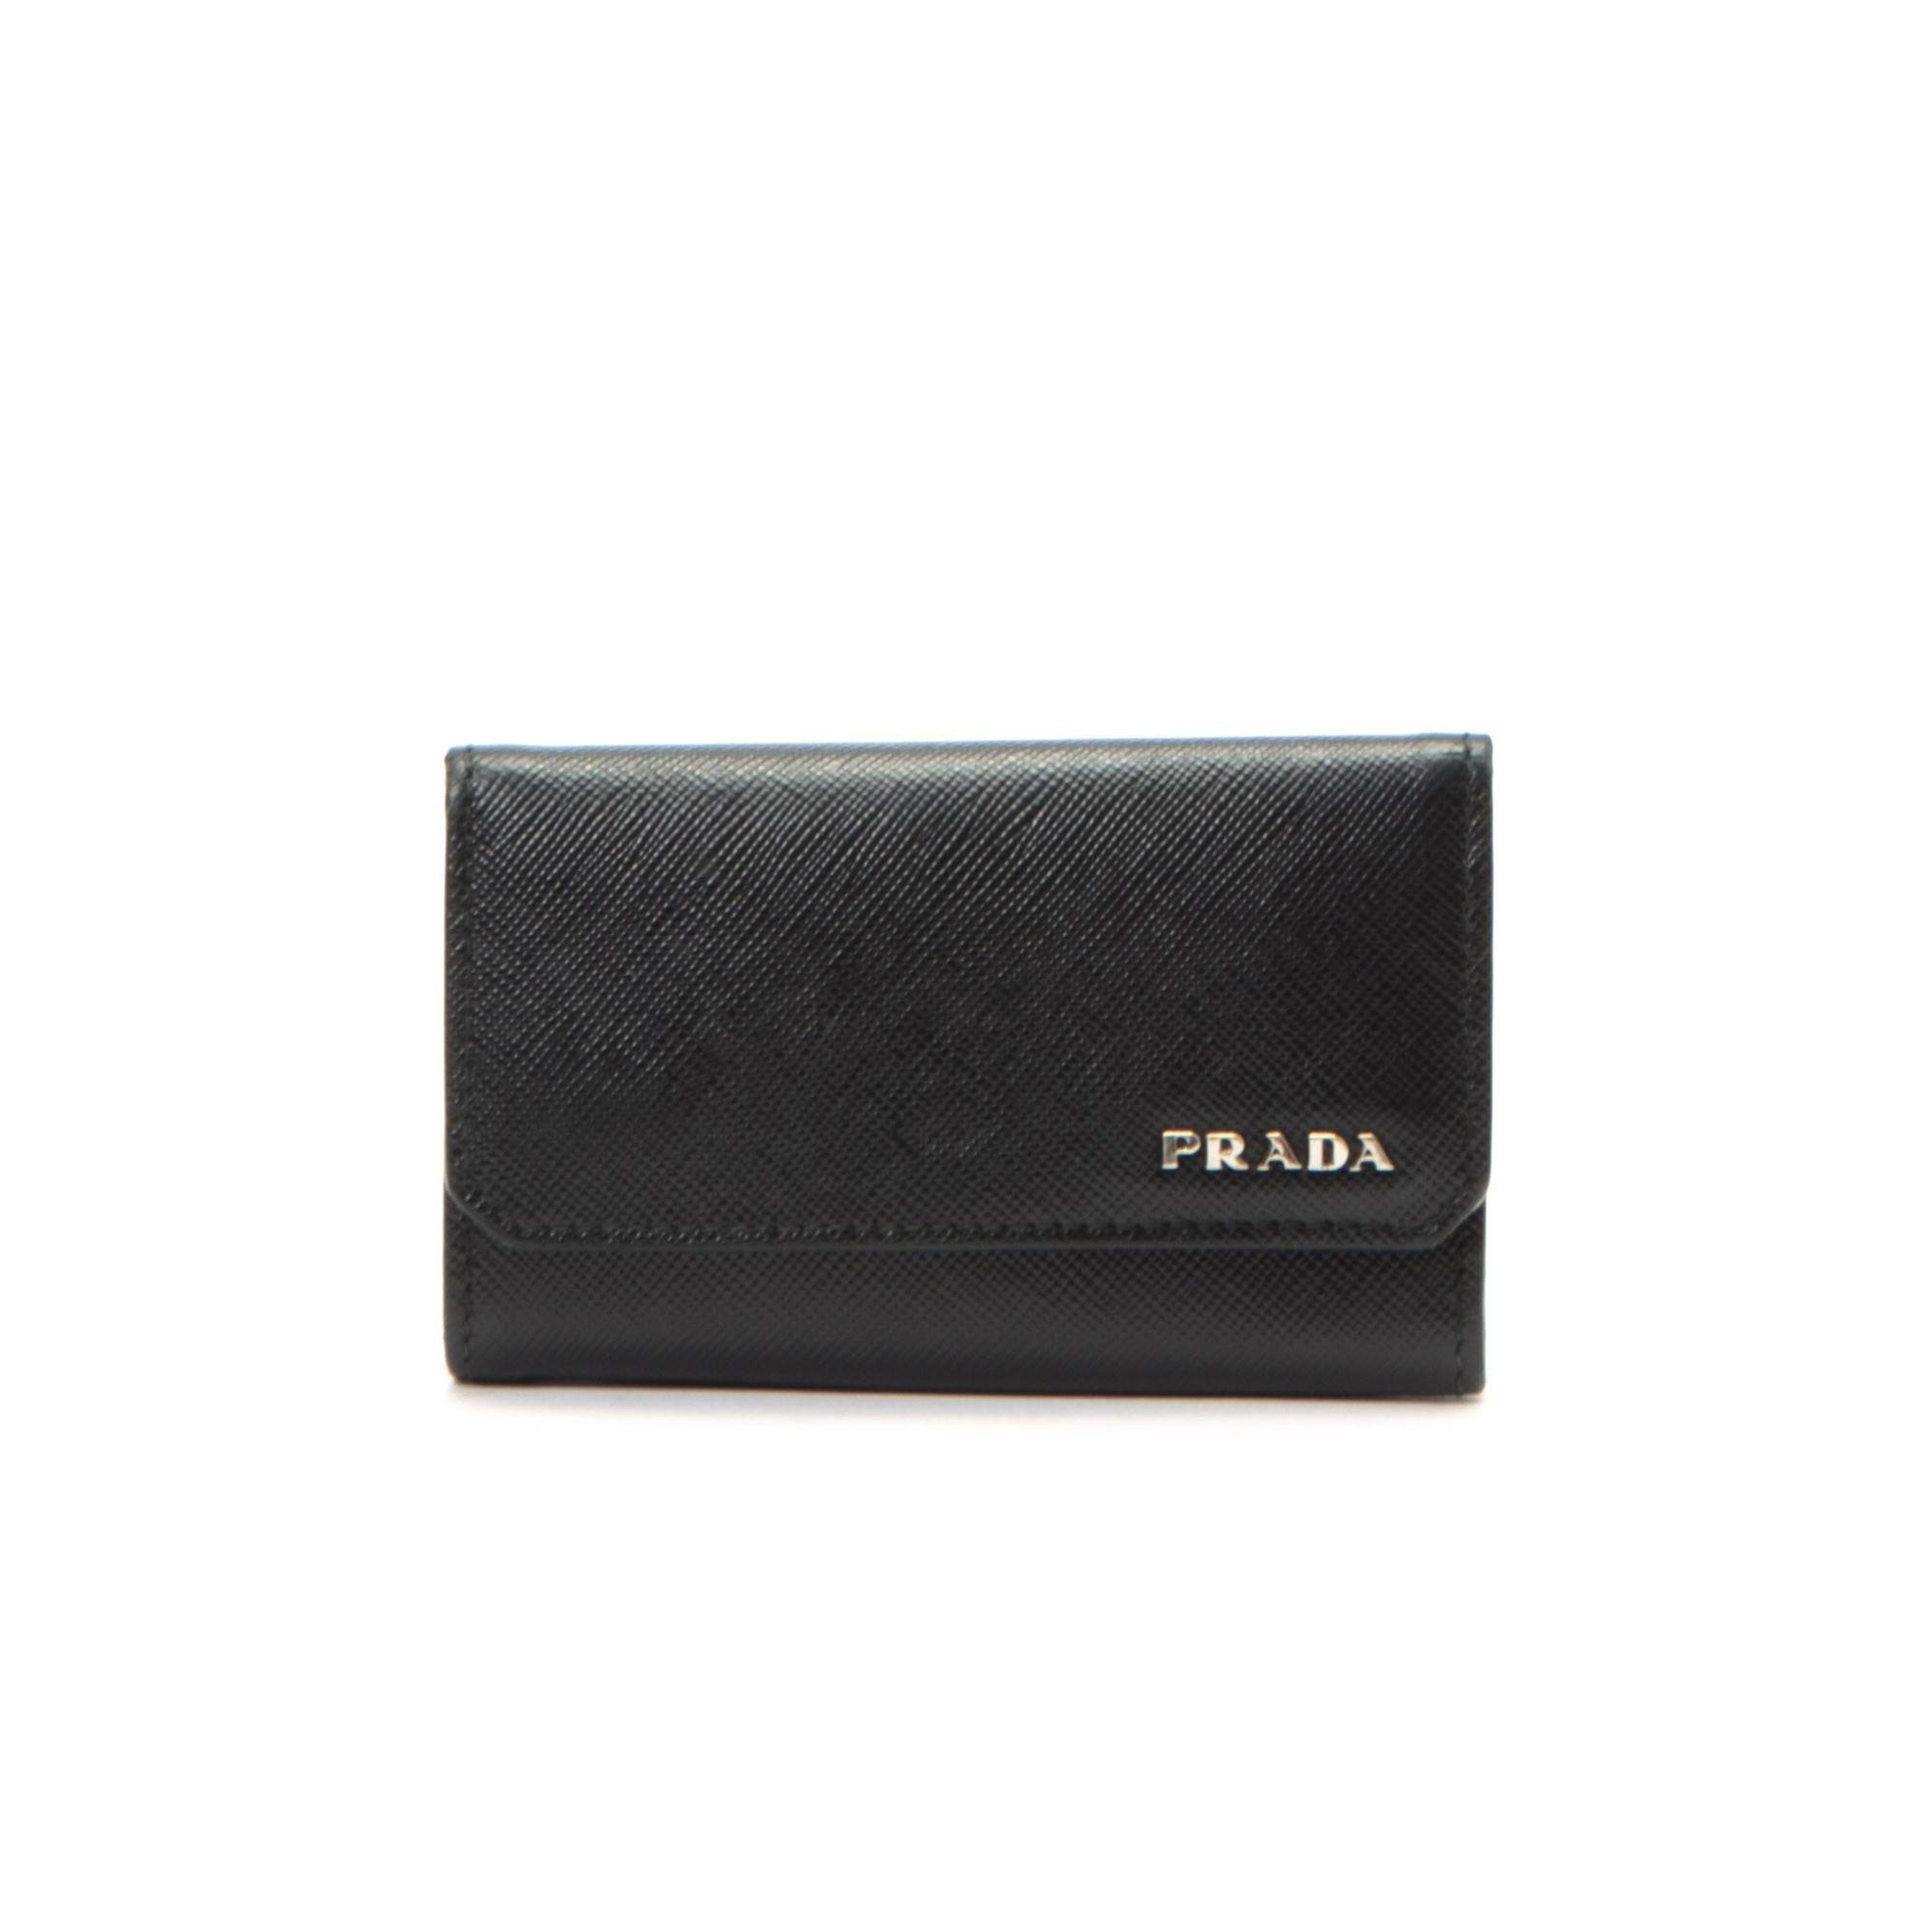 Prada Key Case Saffiano Black Calf Other Small Leather Good ...